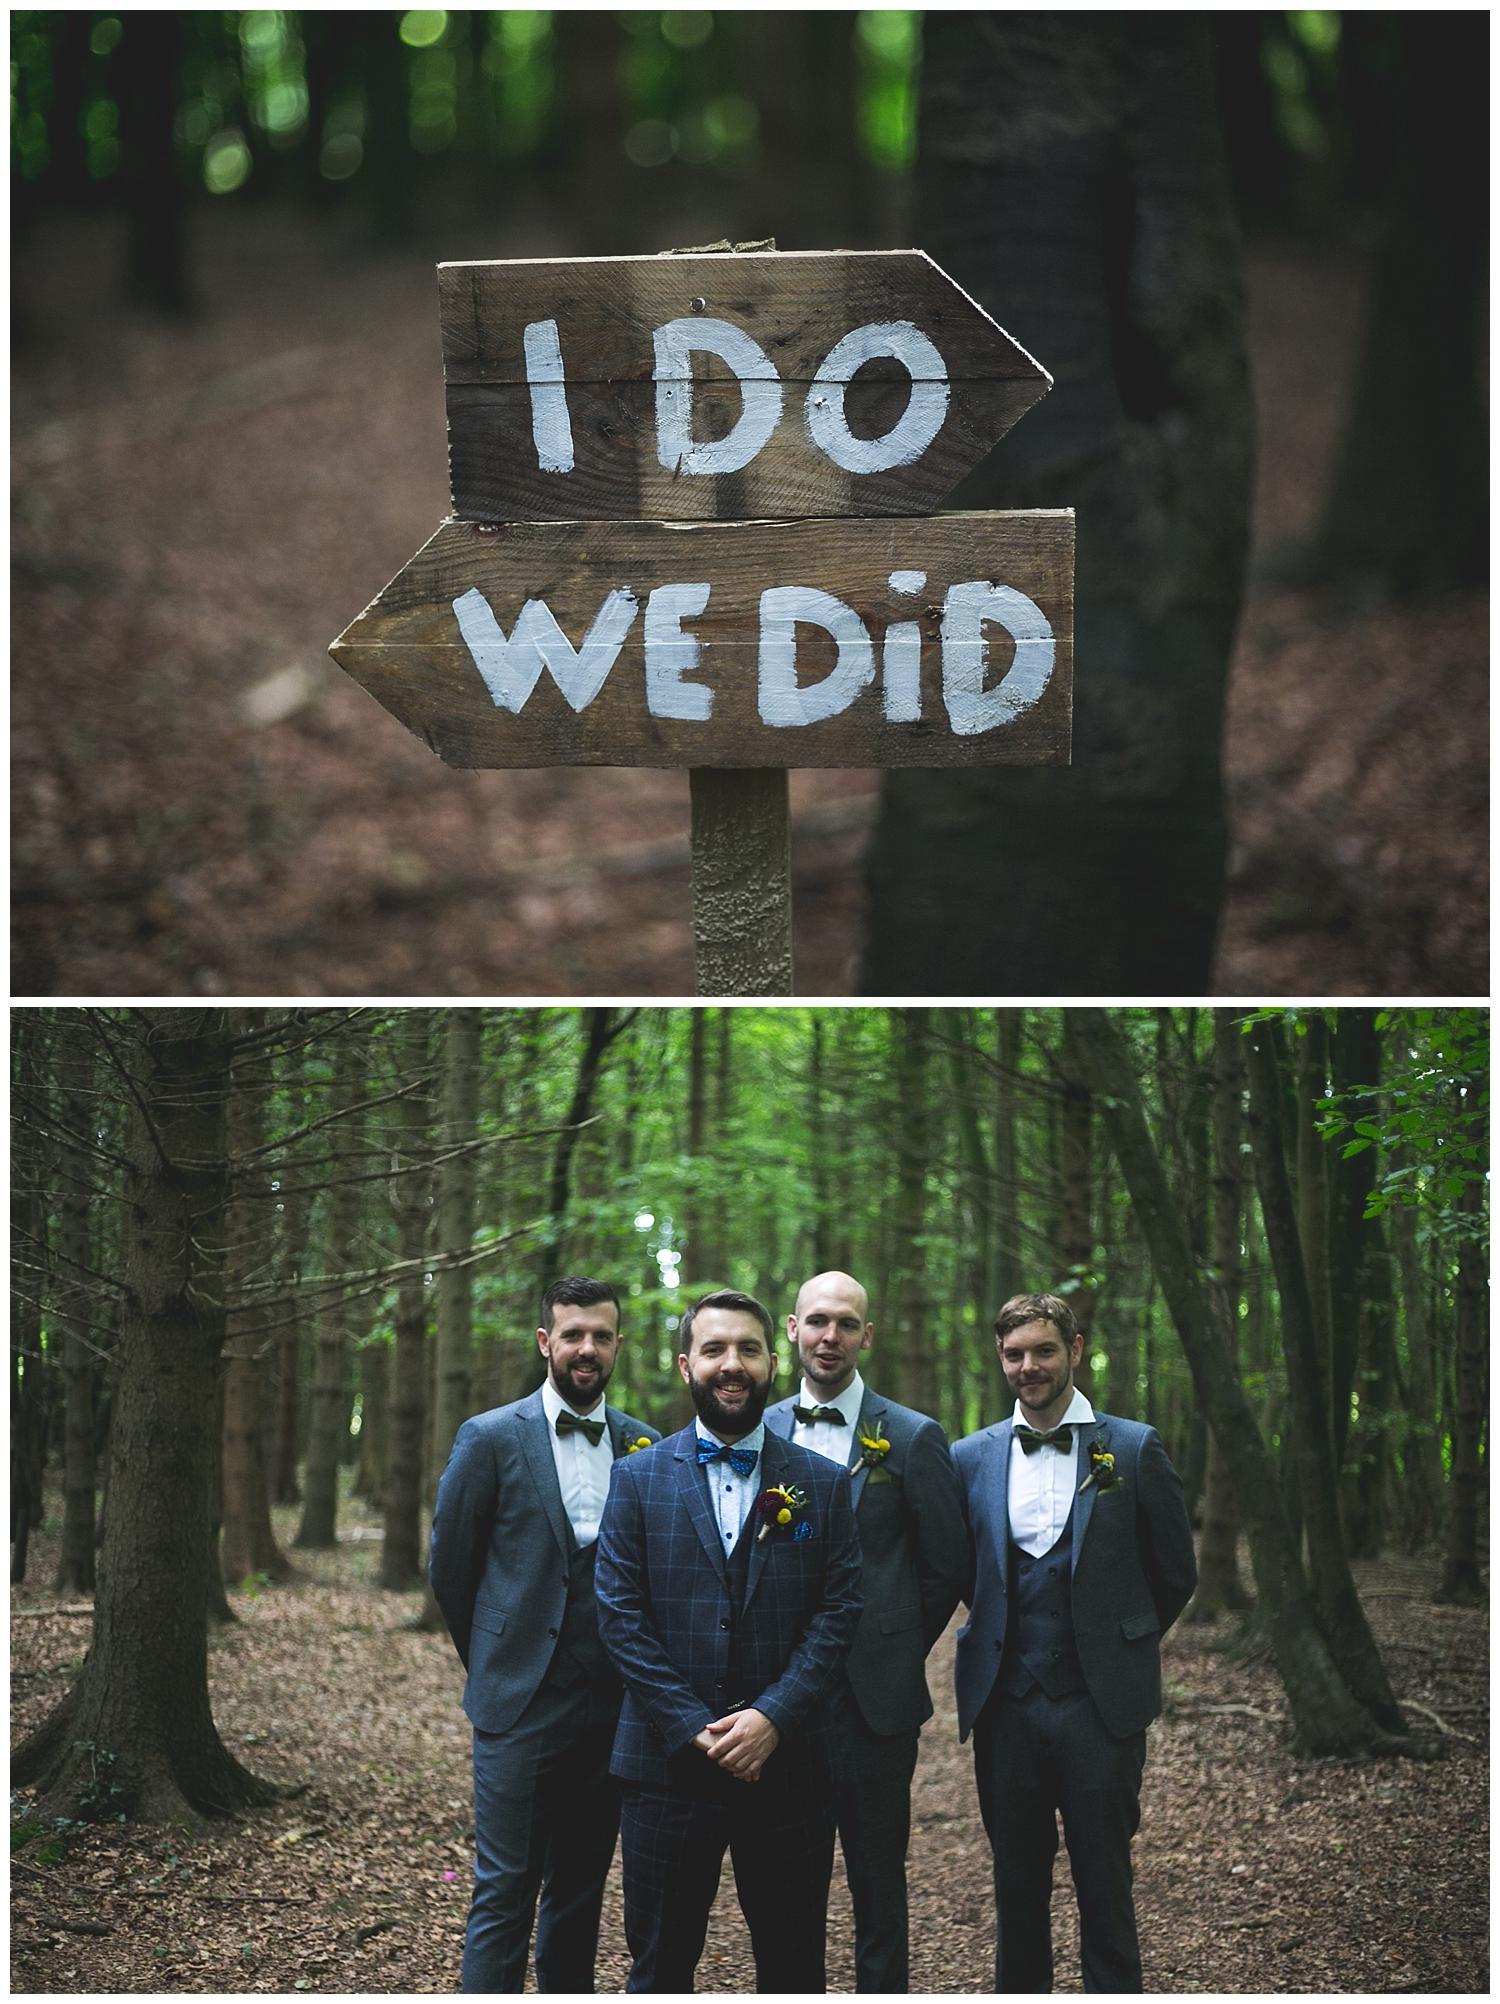 I DO WE DID wedding sign idea